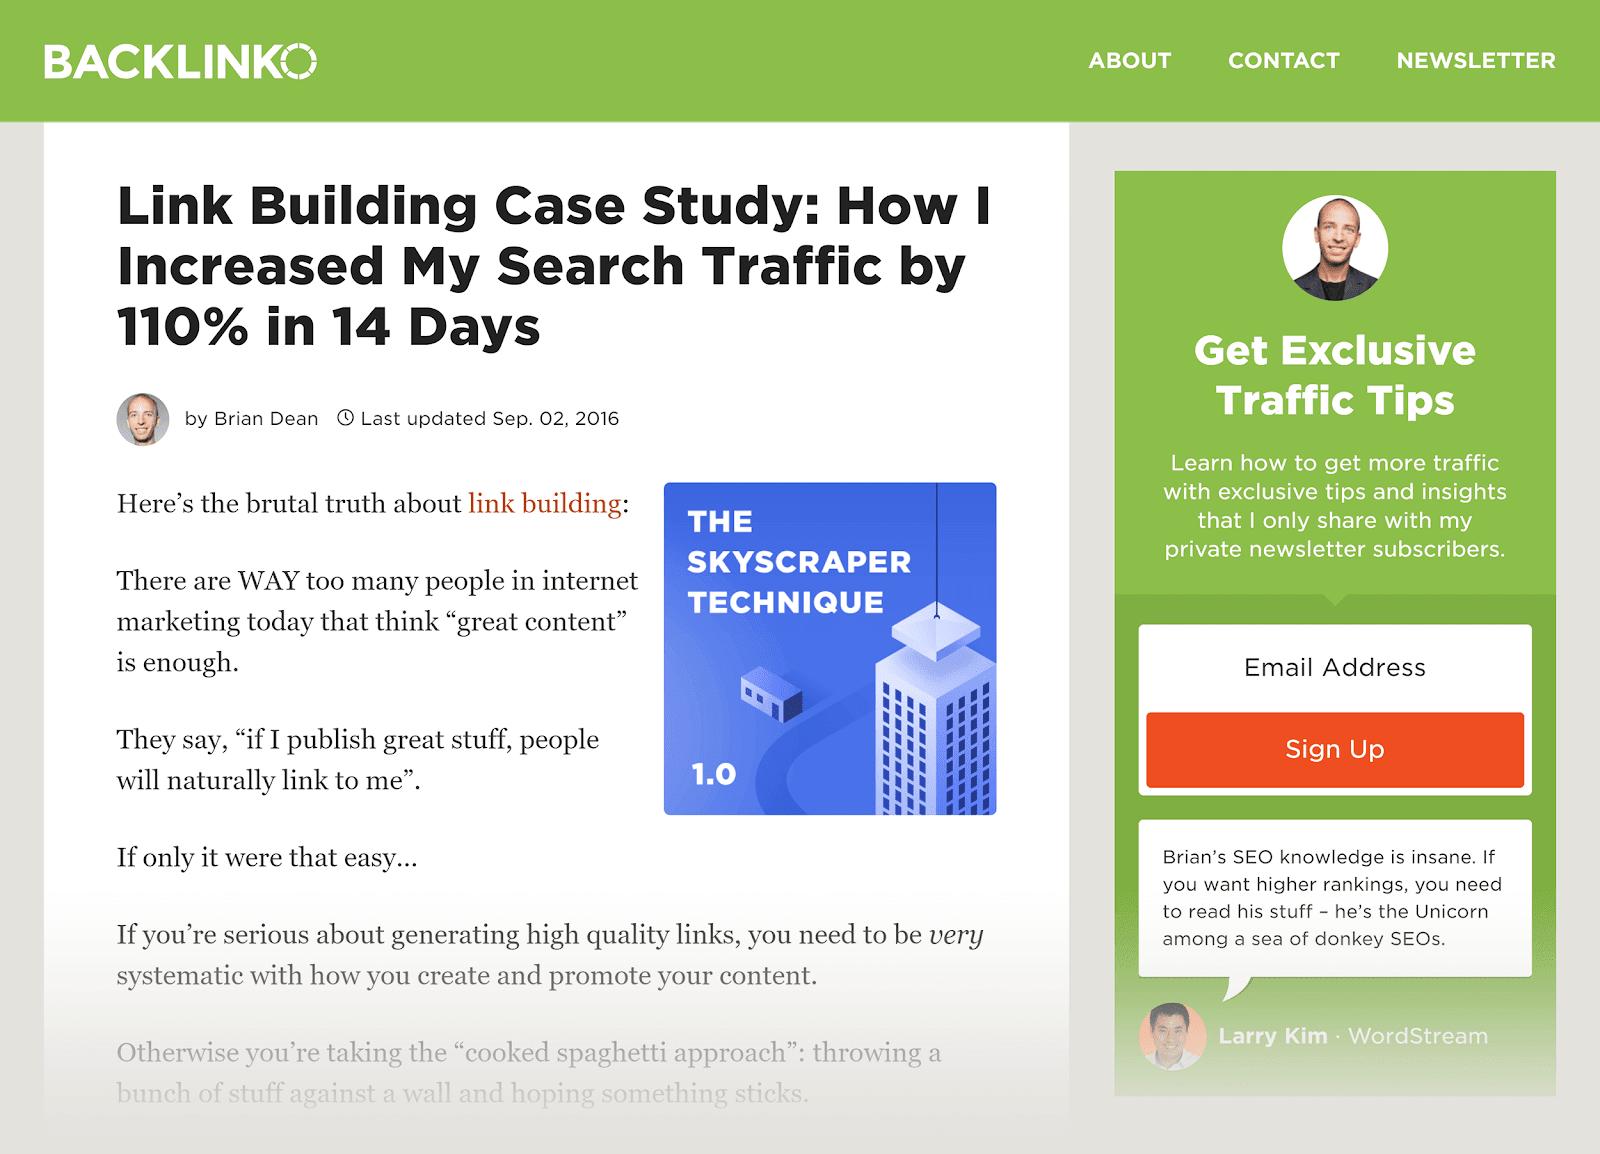 SEO content - Backlinko - Link Building Case Study